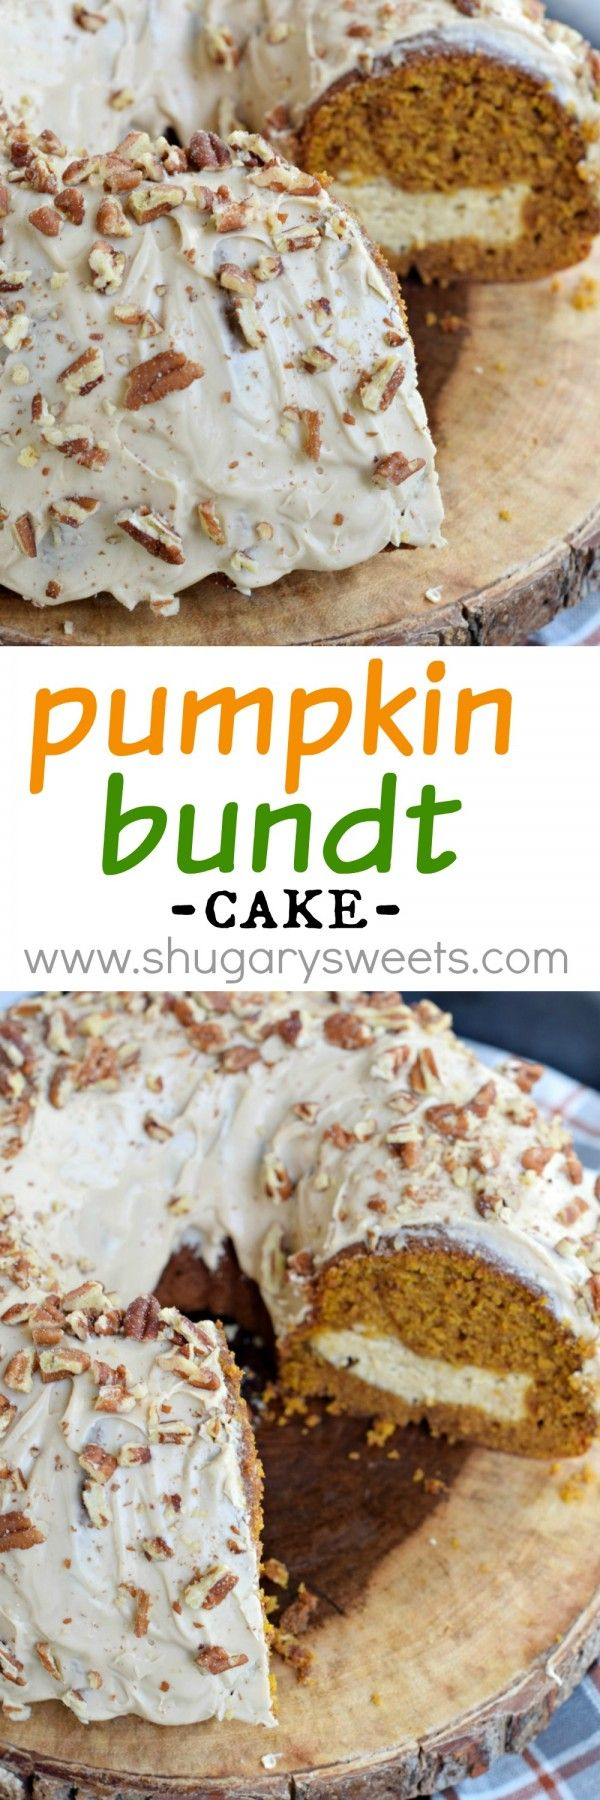 180 best Cake decorating images on Pinterest